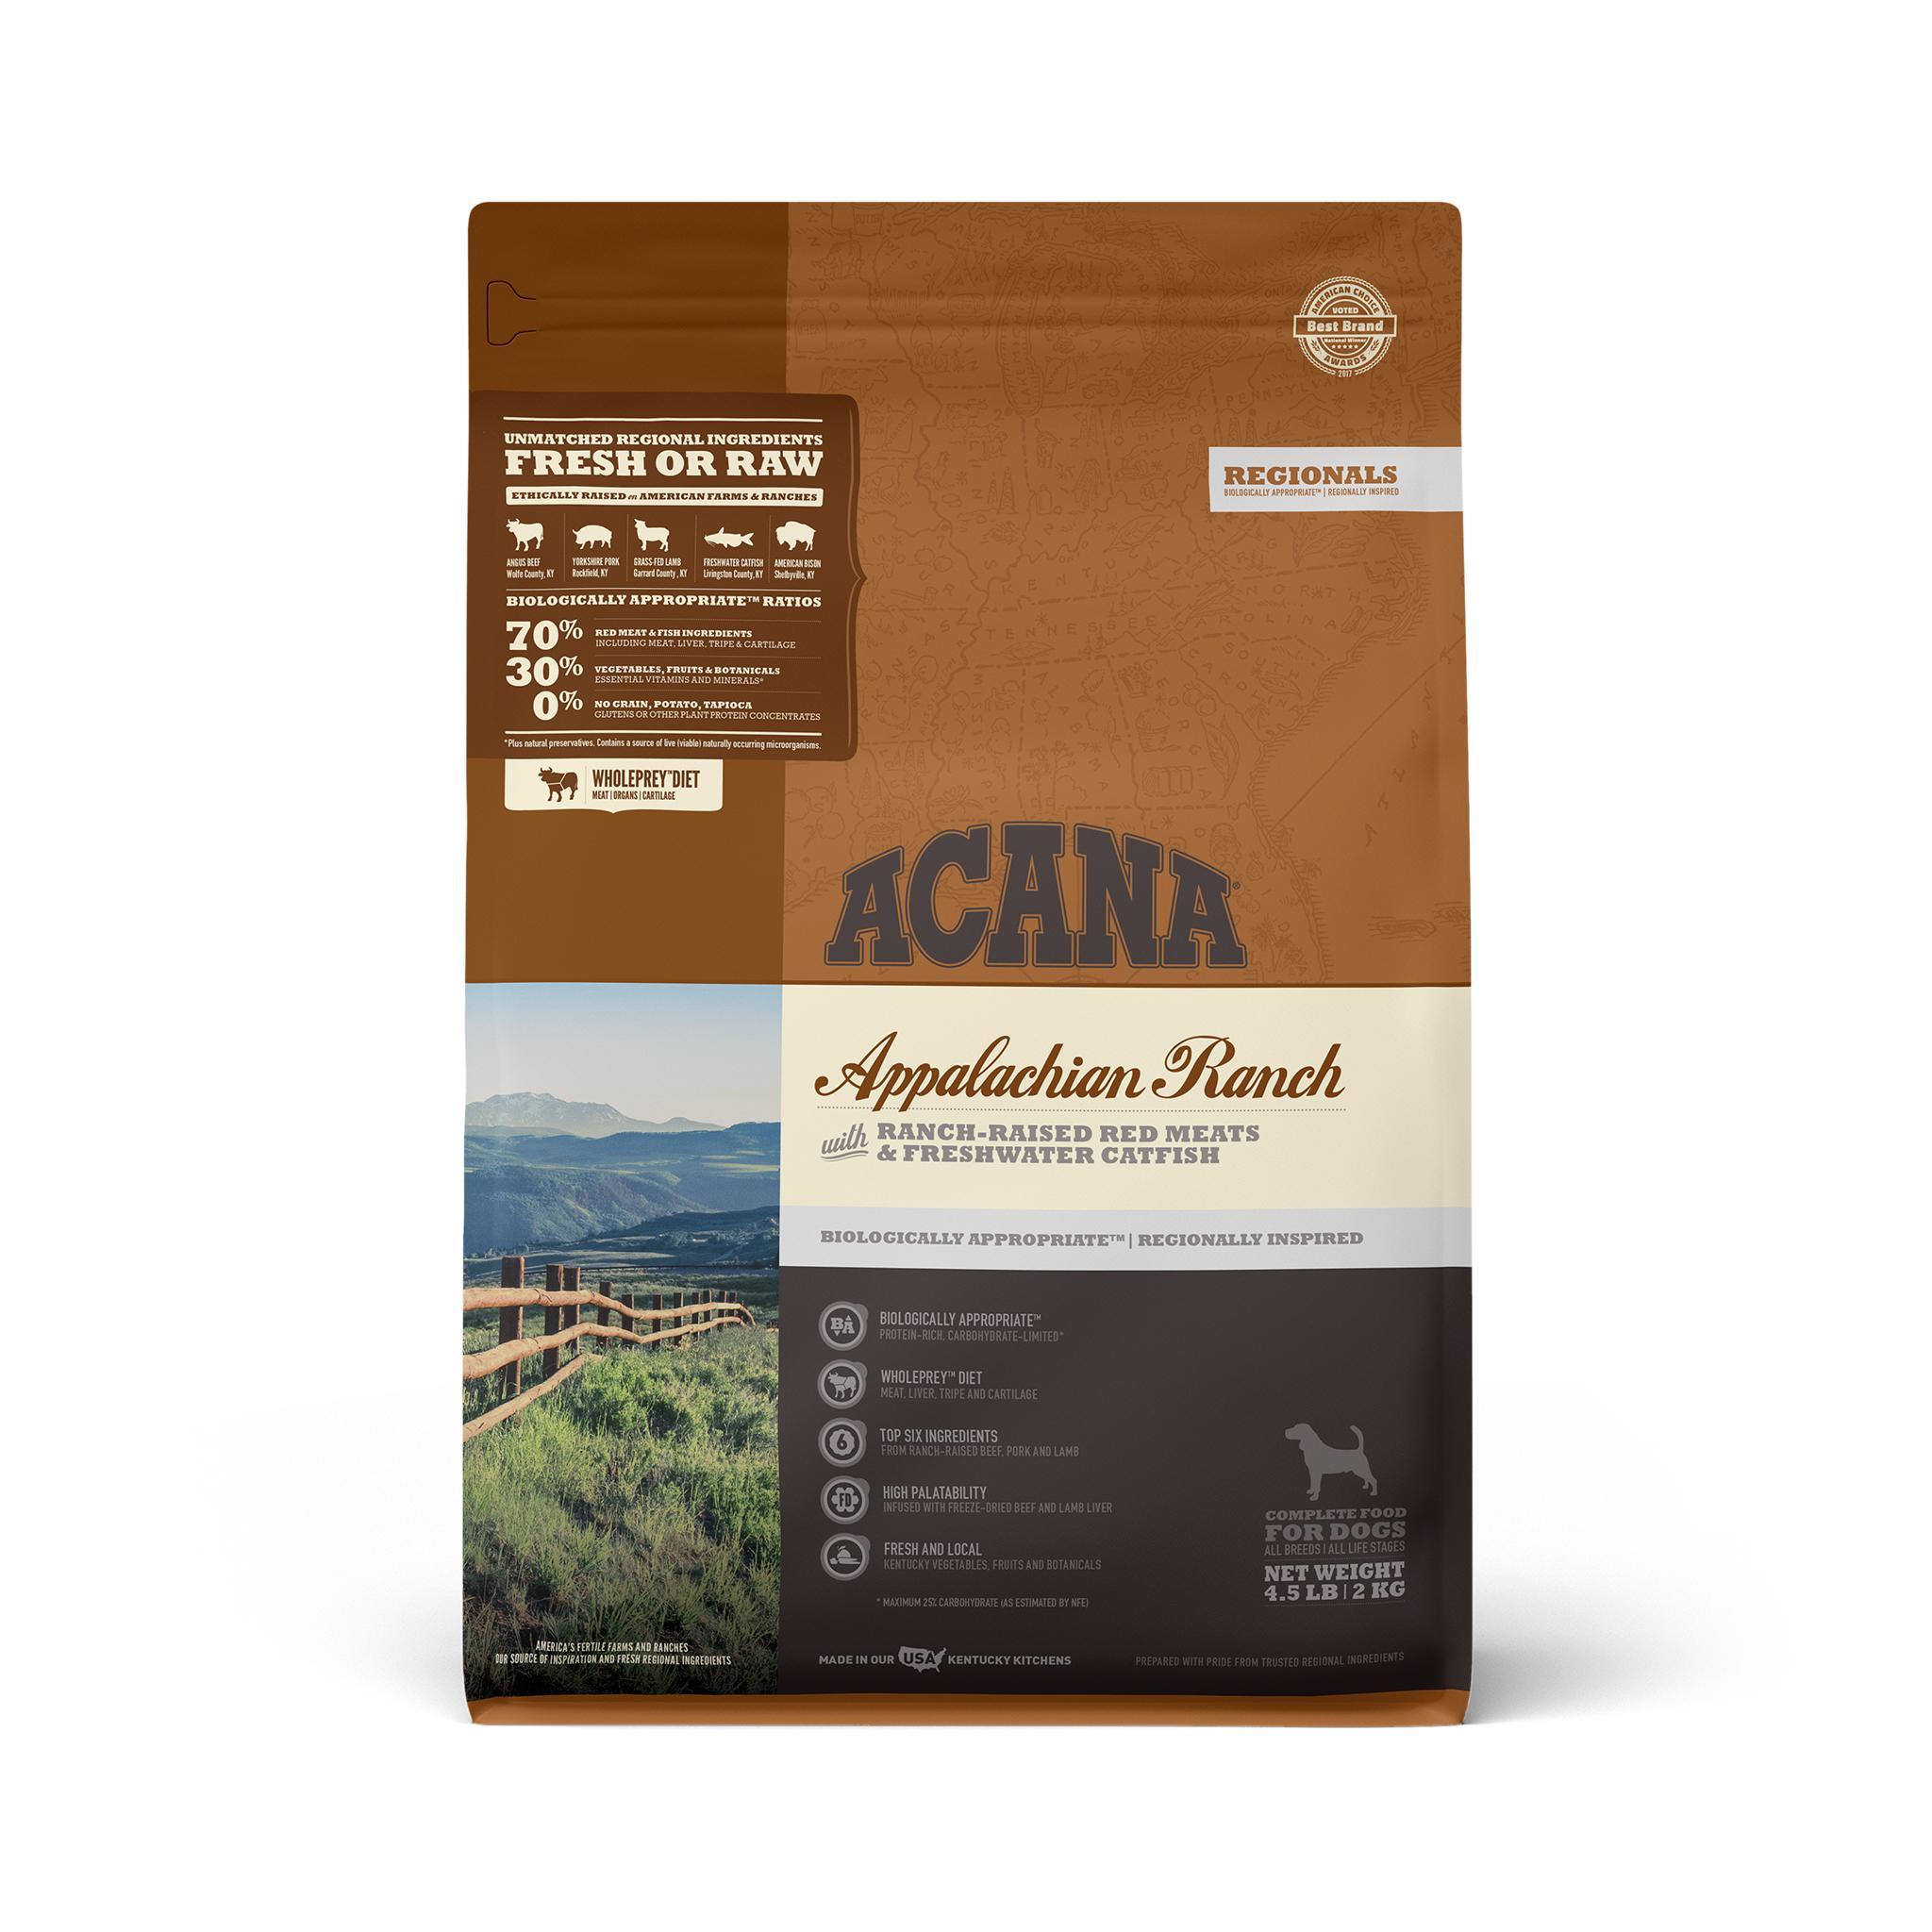 ACANA Regionals Appalachian Ranch Grain-Free Dry Dog Food, 4.5-lb